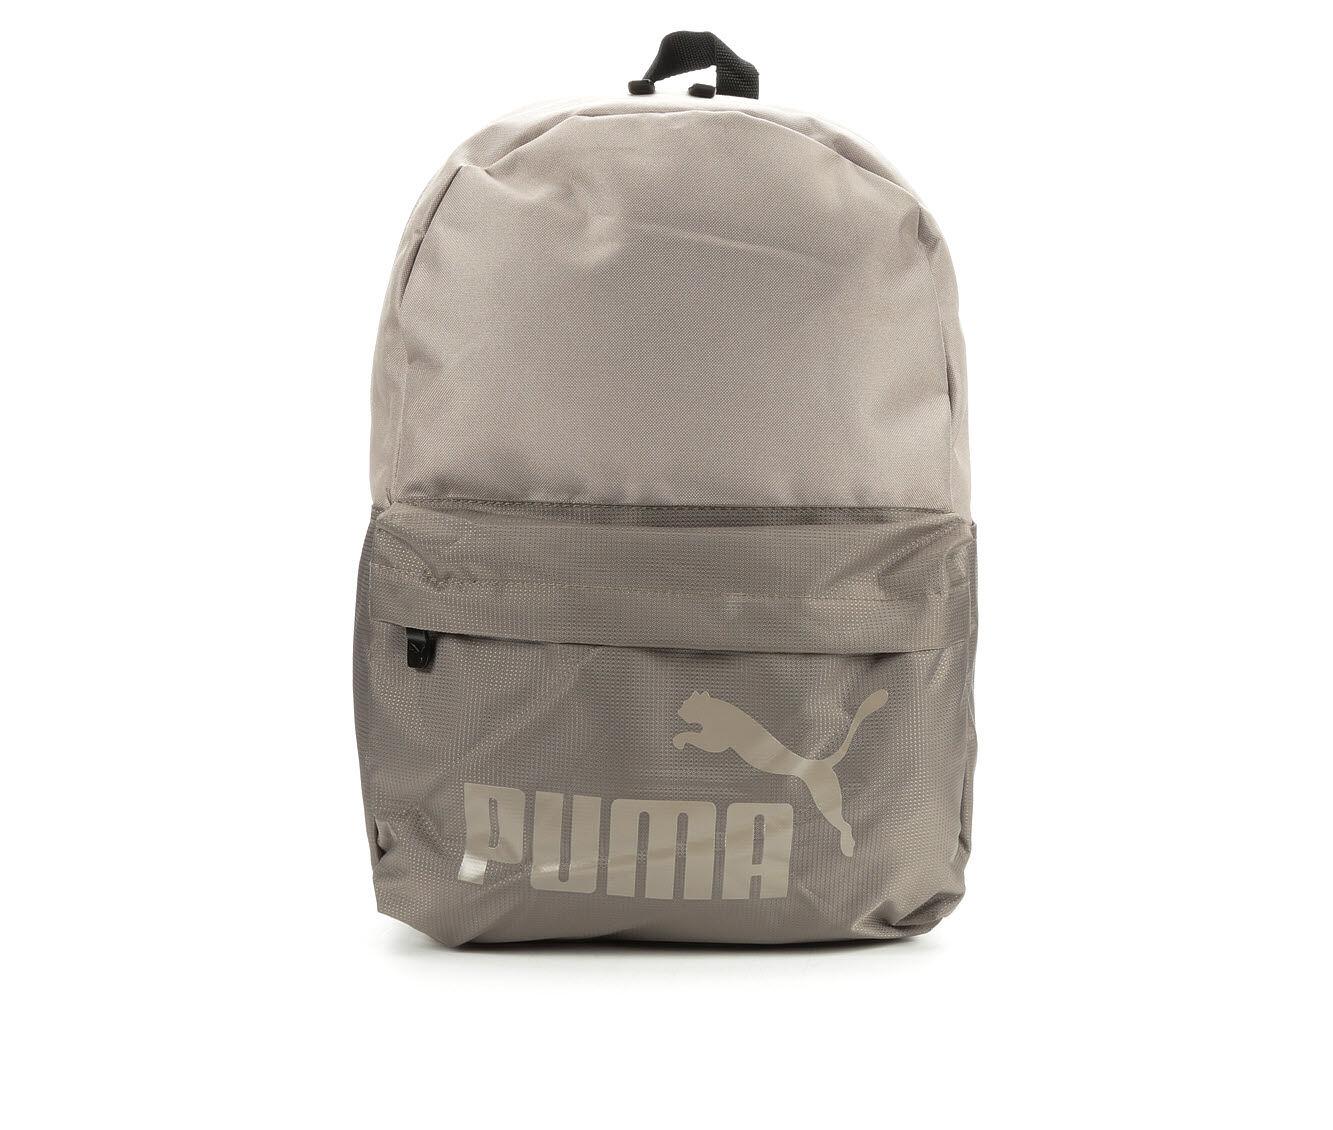 0b0fbd49d9 Puma lifeline backpack shoe carnival jpg 1694x1436 Shoe carnival backpacks